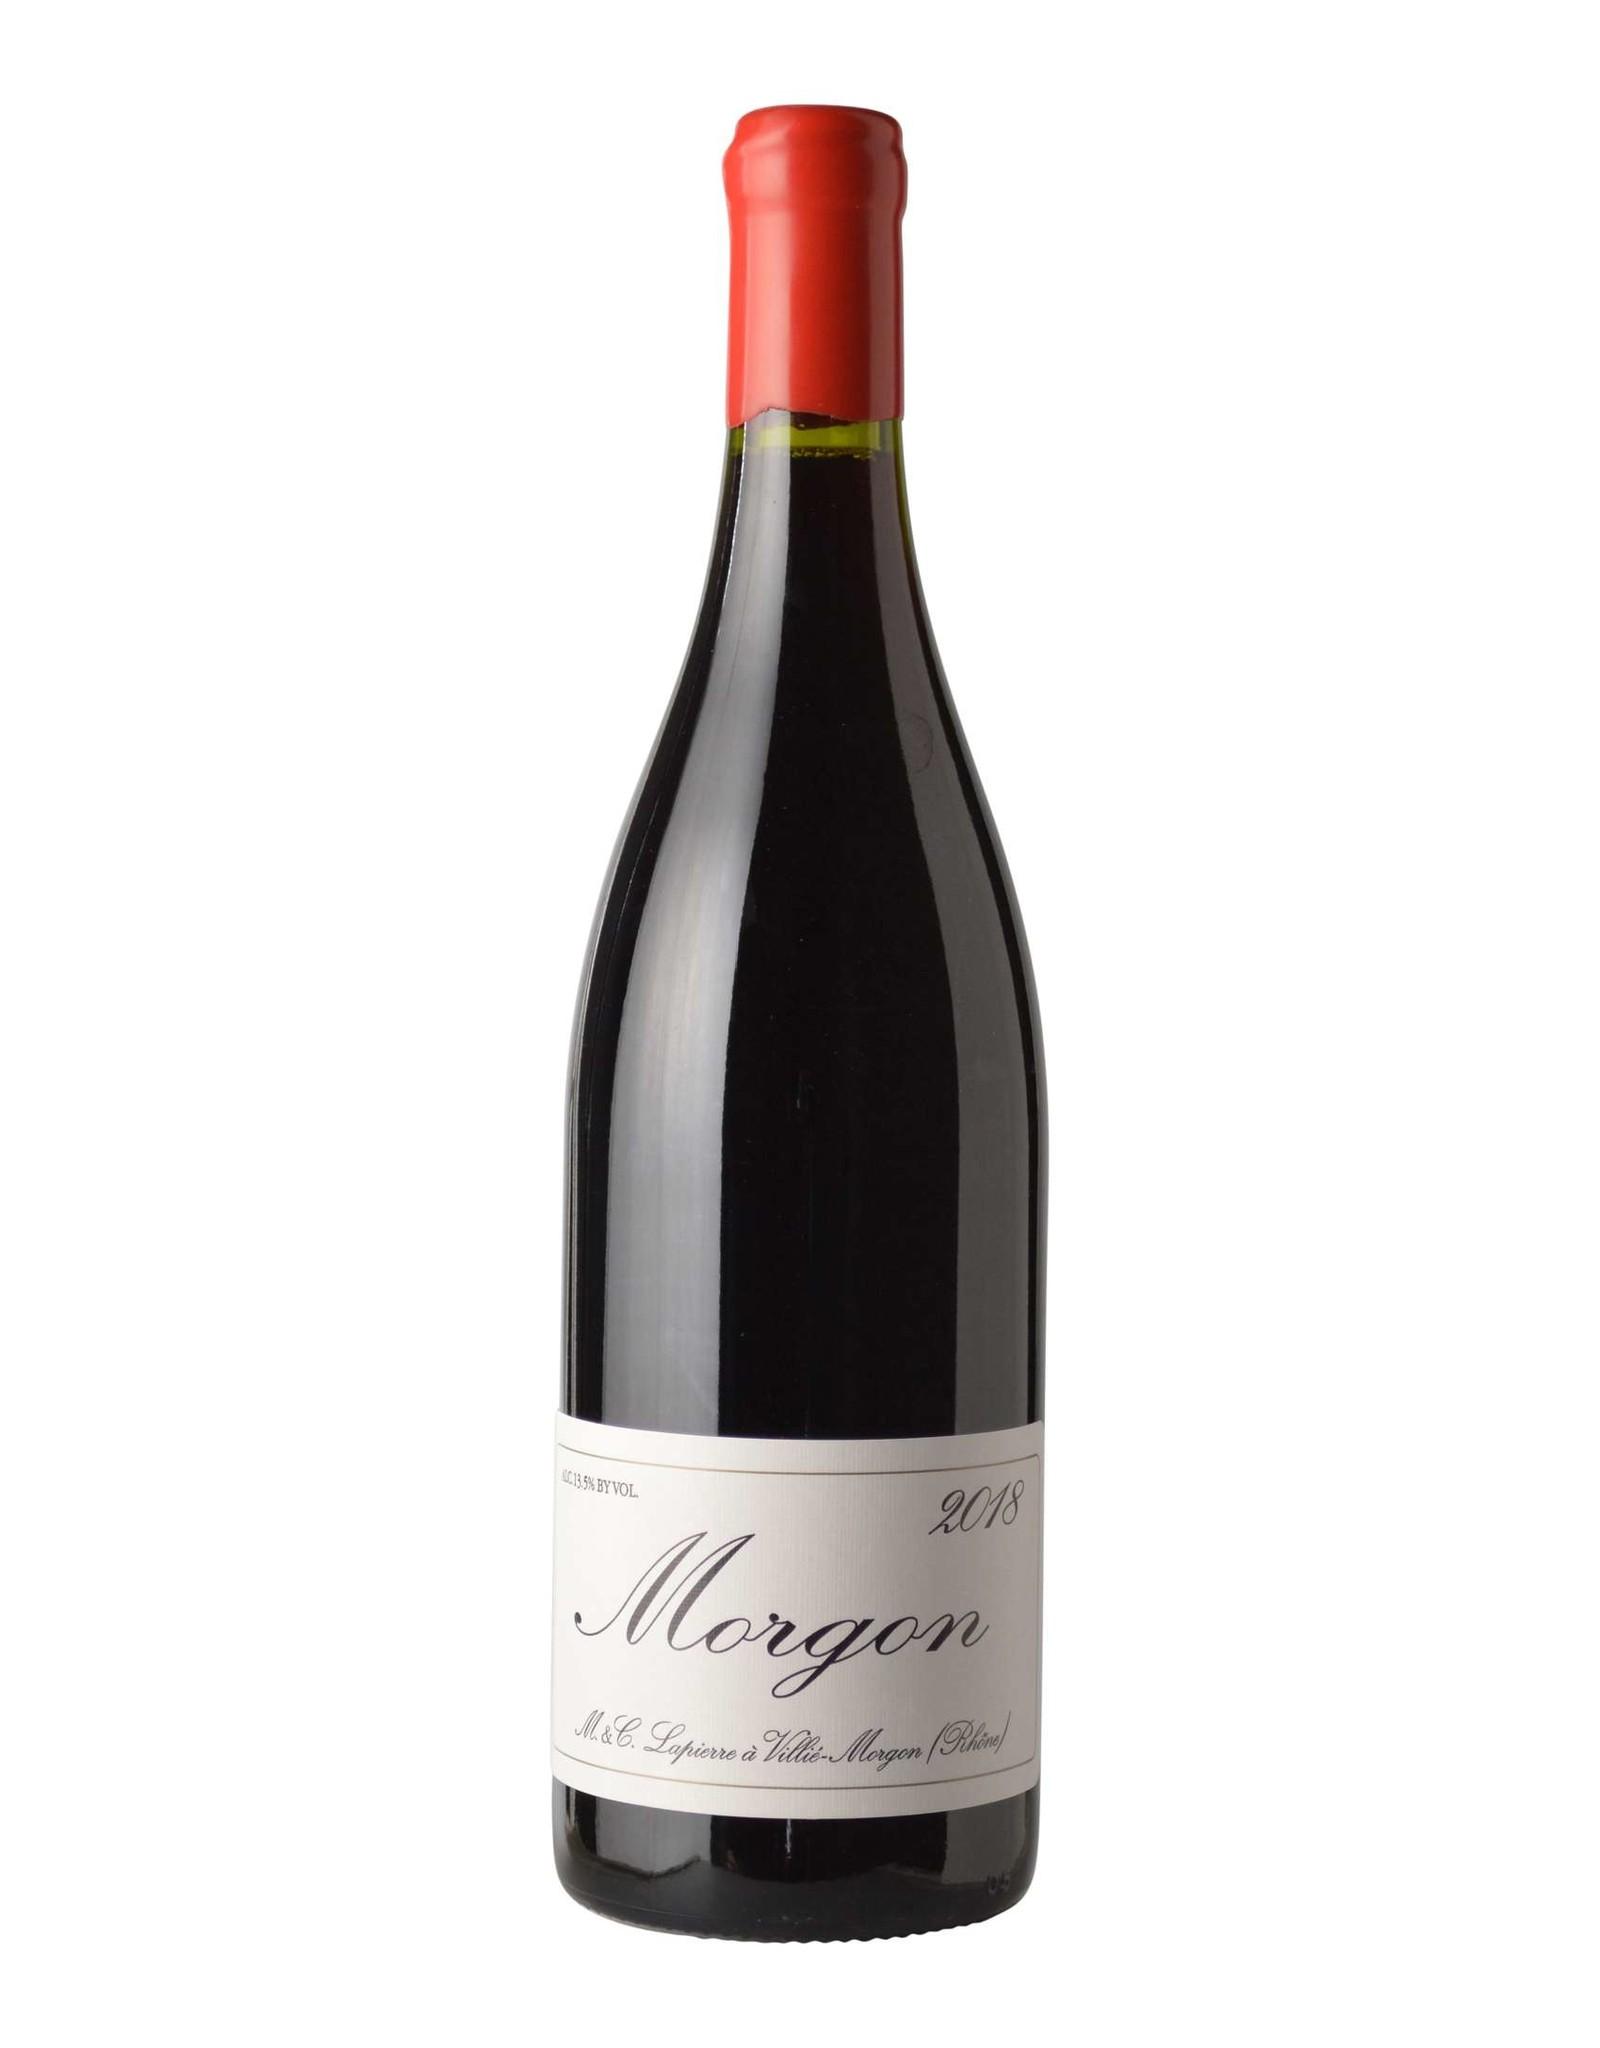 Marcel Lapierre Morgon 3 Liter